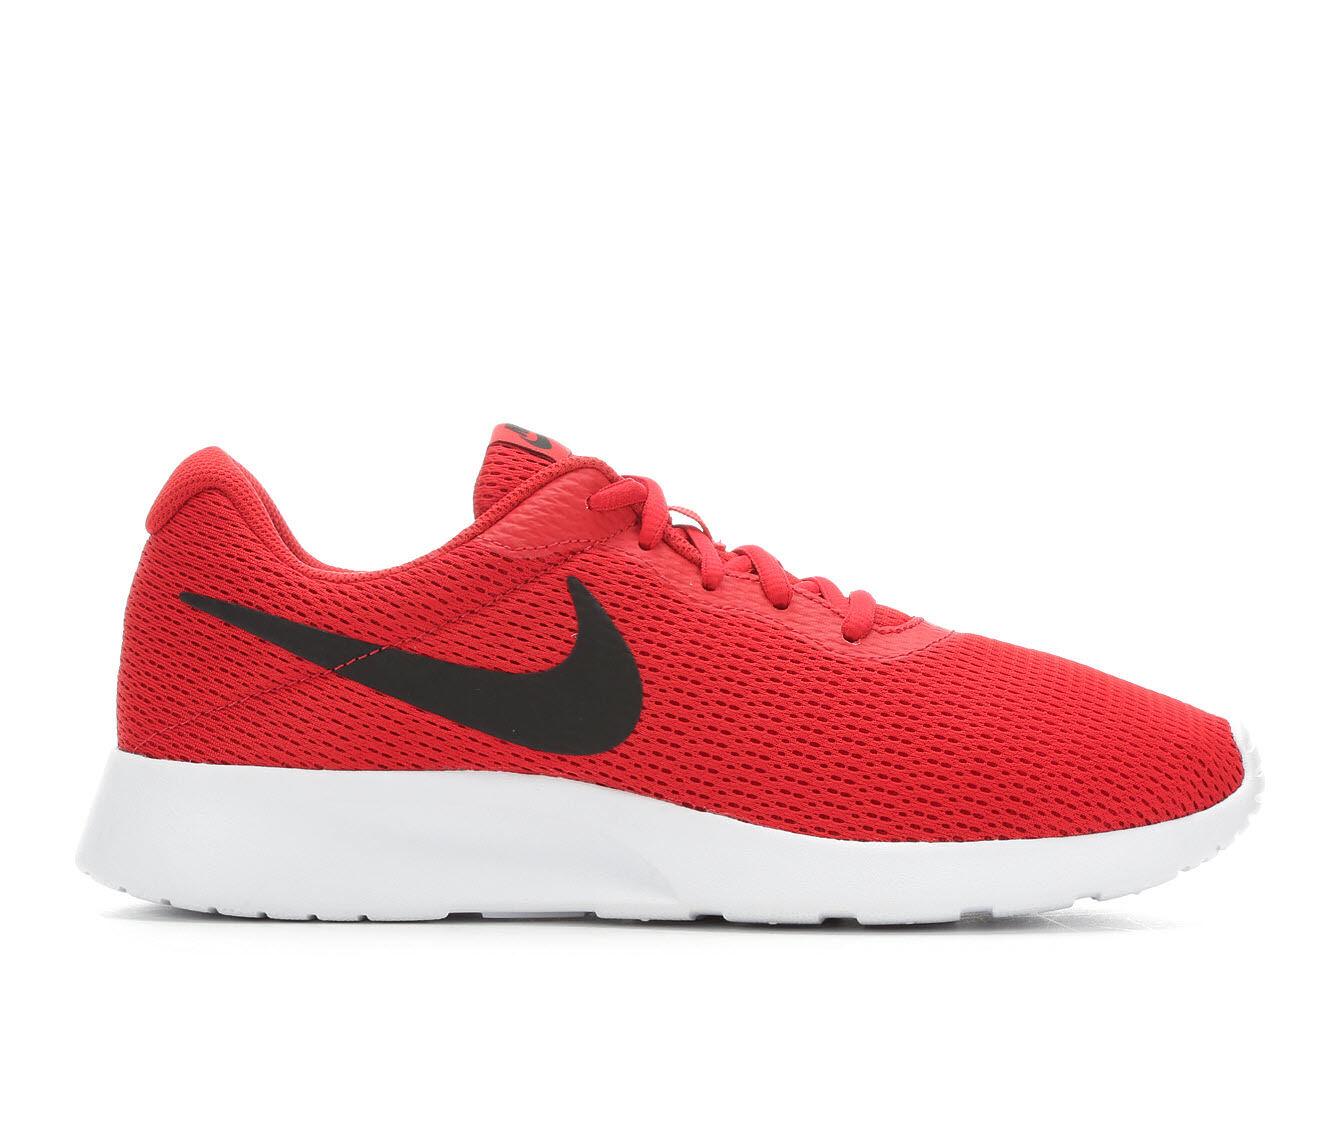 Men's Nike Tanjun Sneakers Red/Black/White